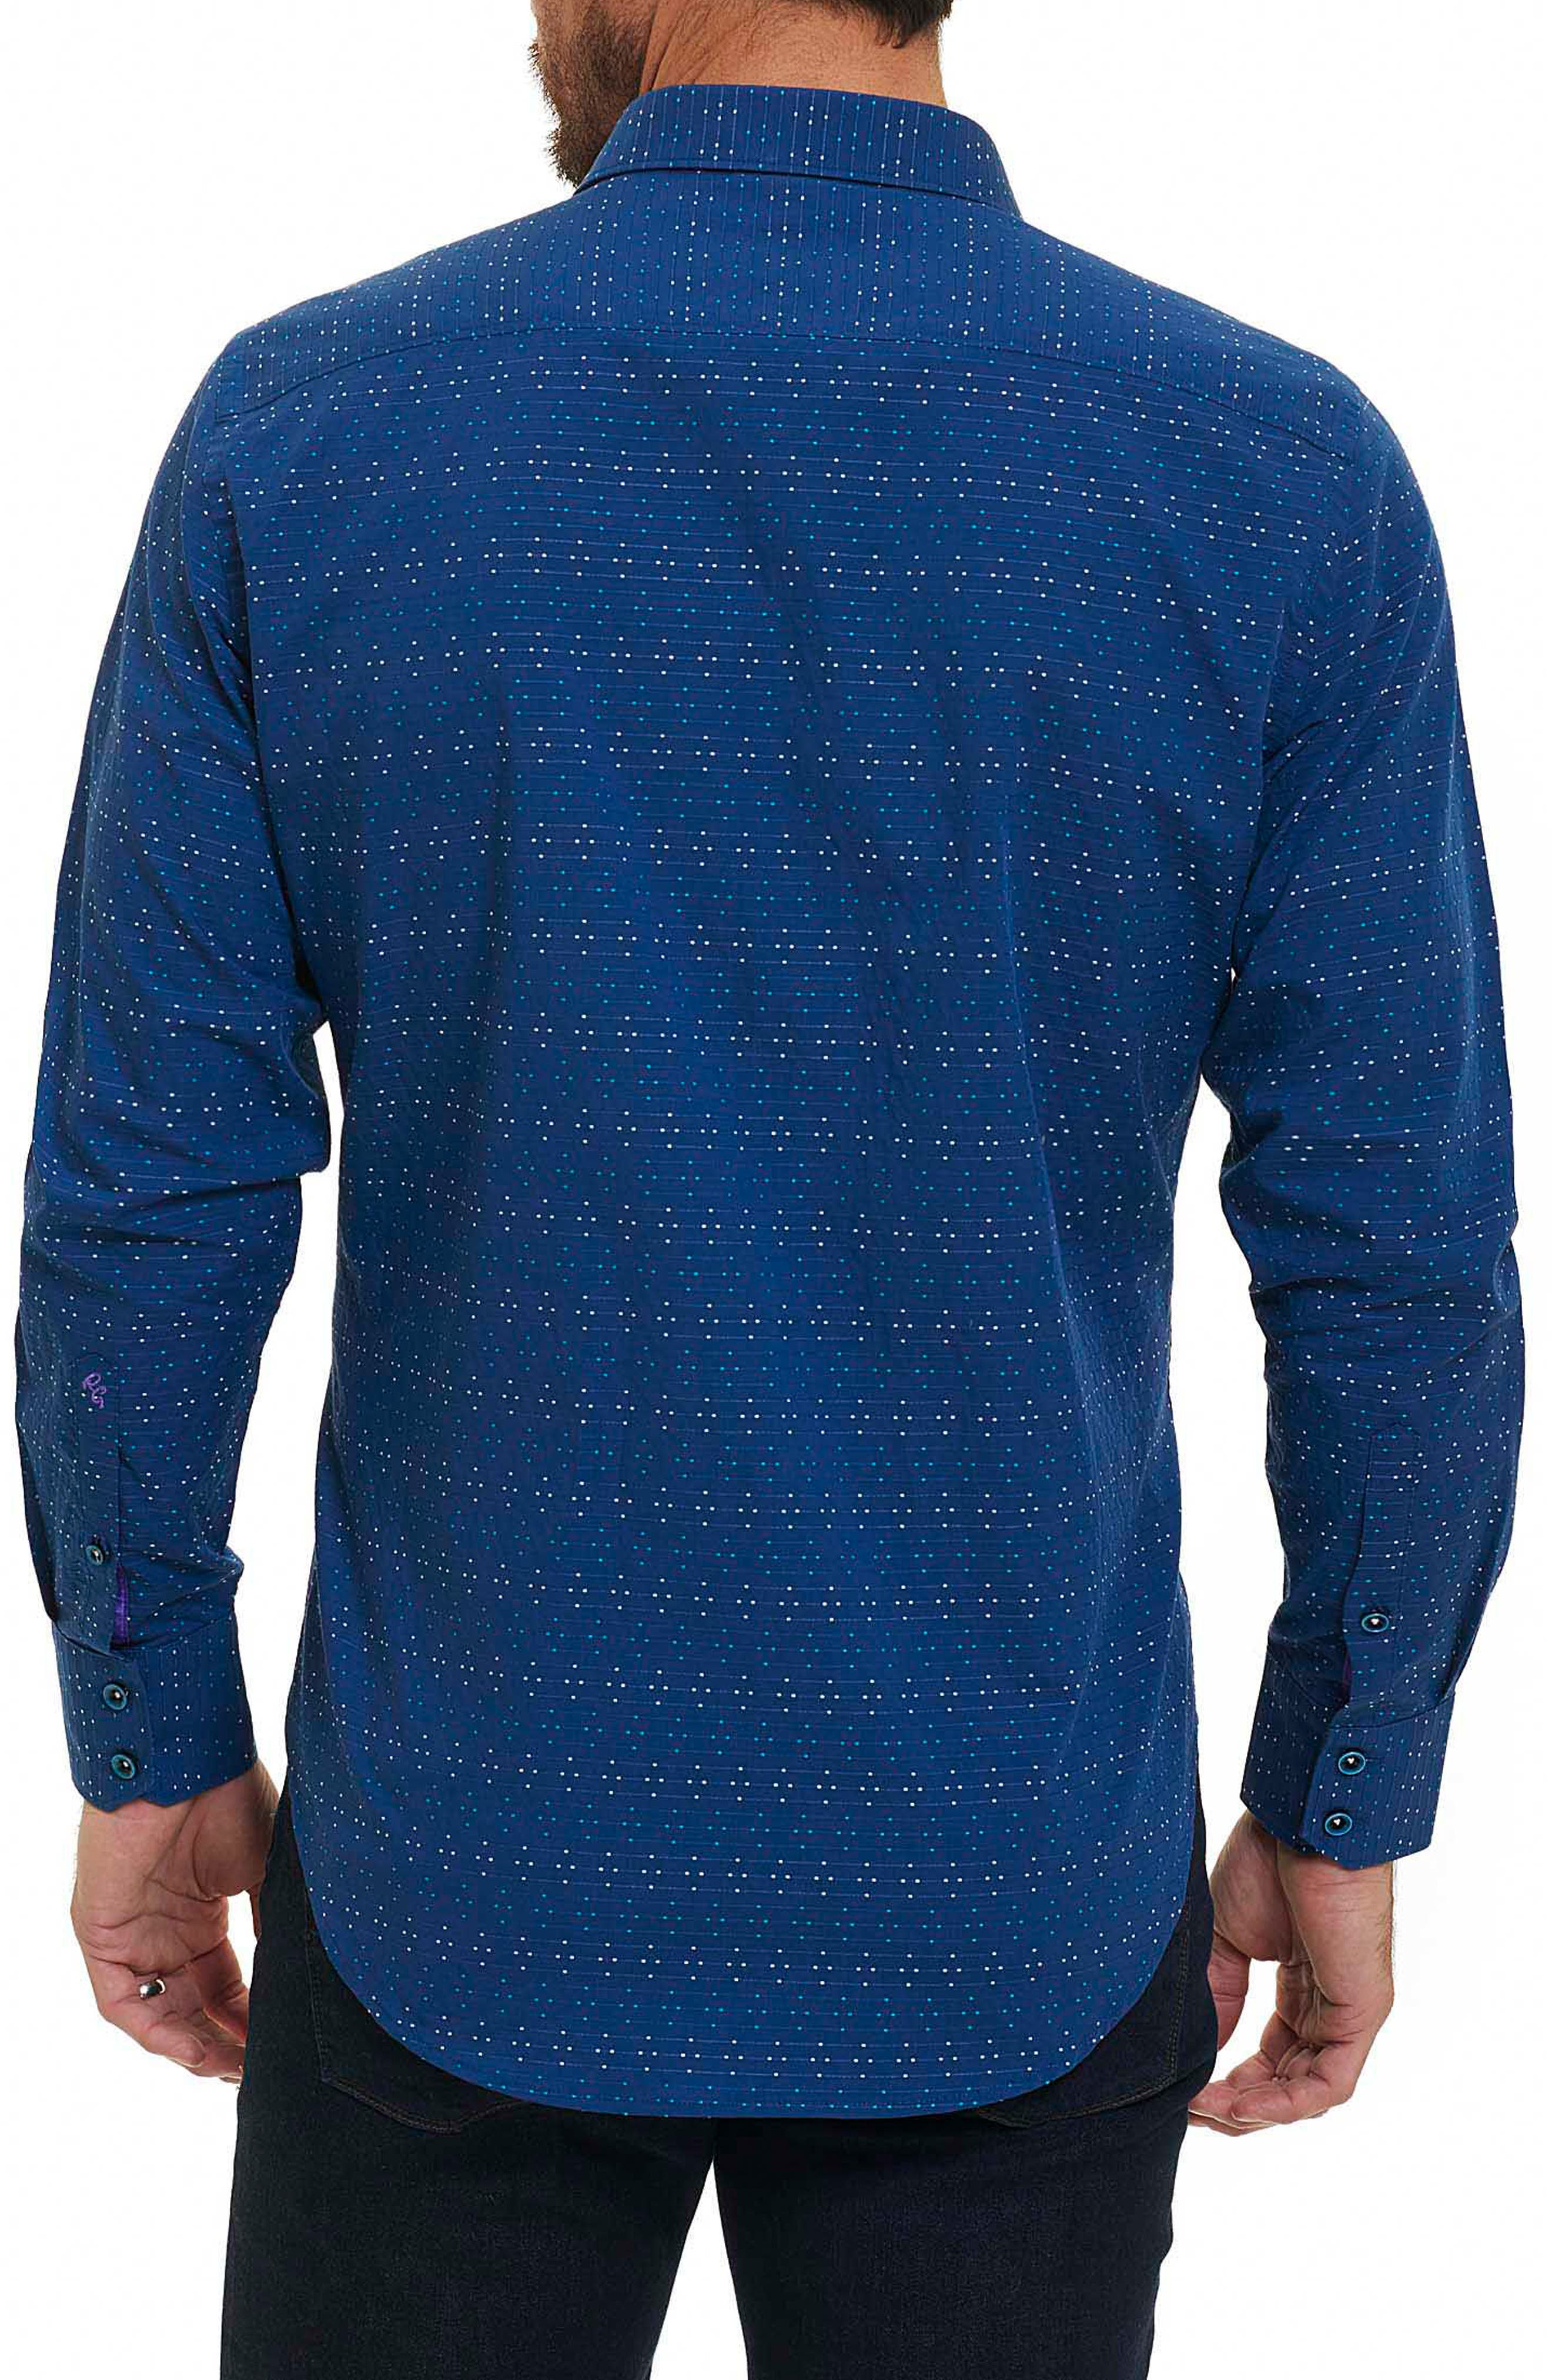 Dev Classic Fit Sport Shirt,                             Alternate thumbnail 2, color,                             410